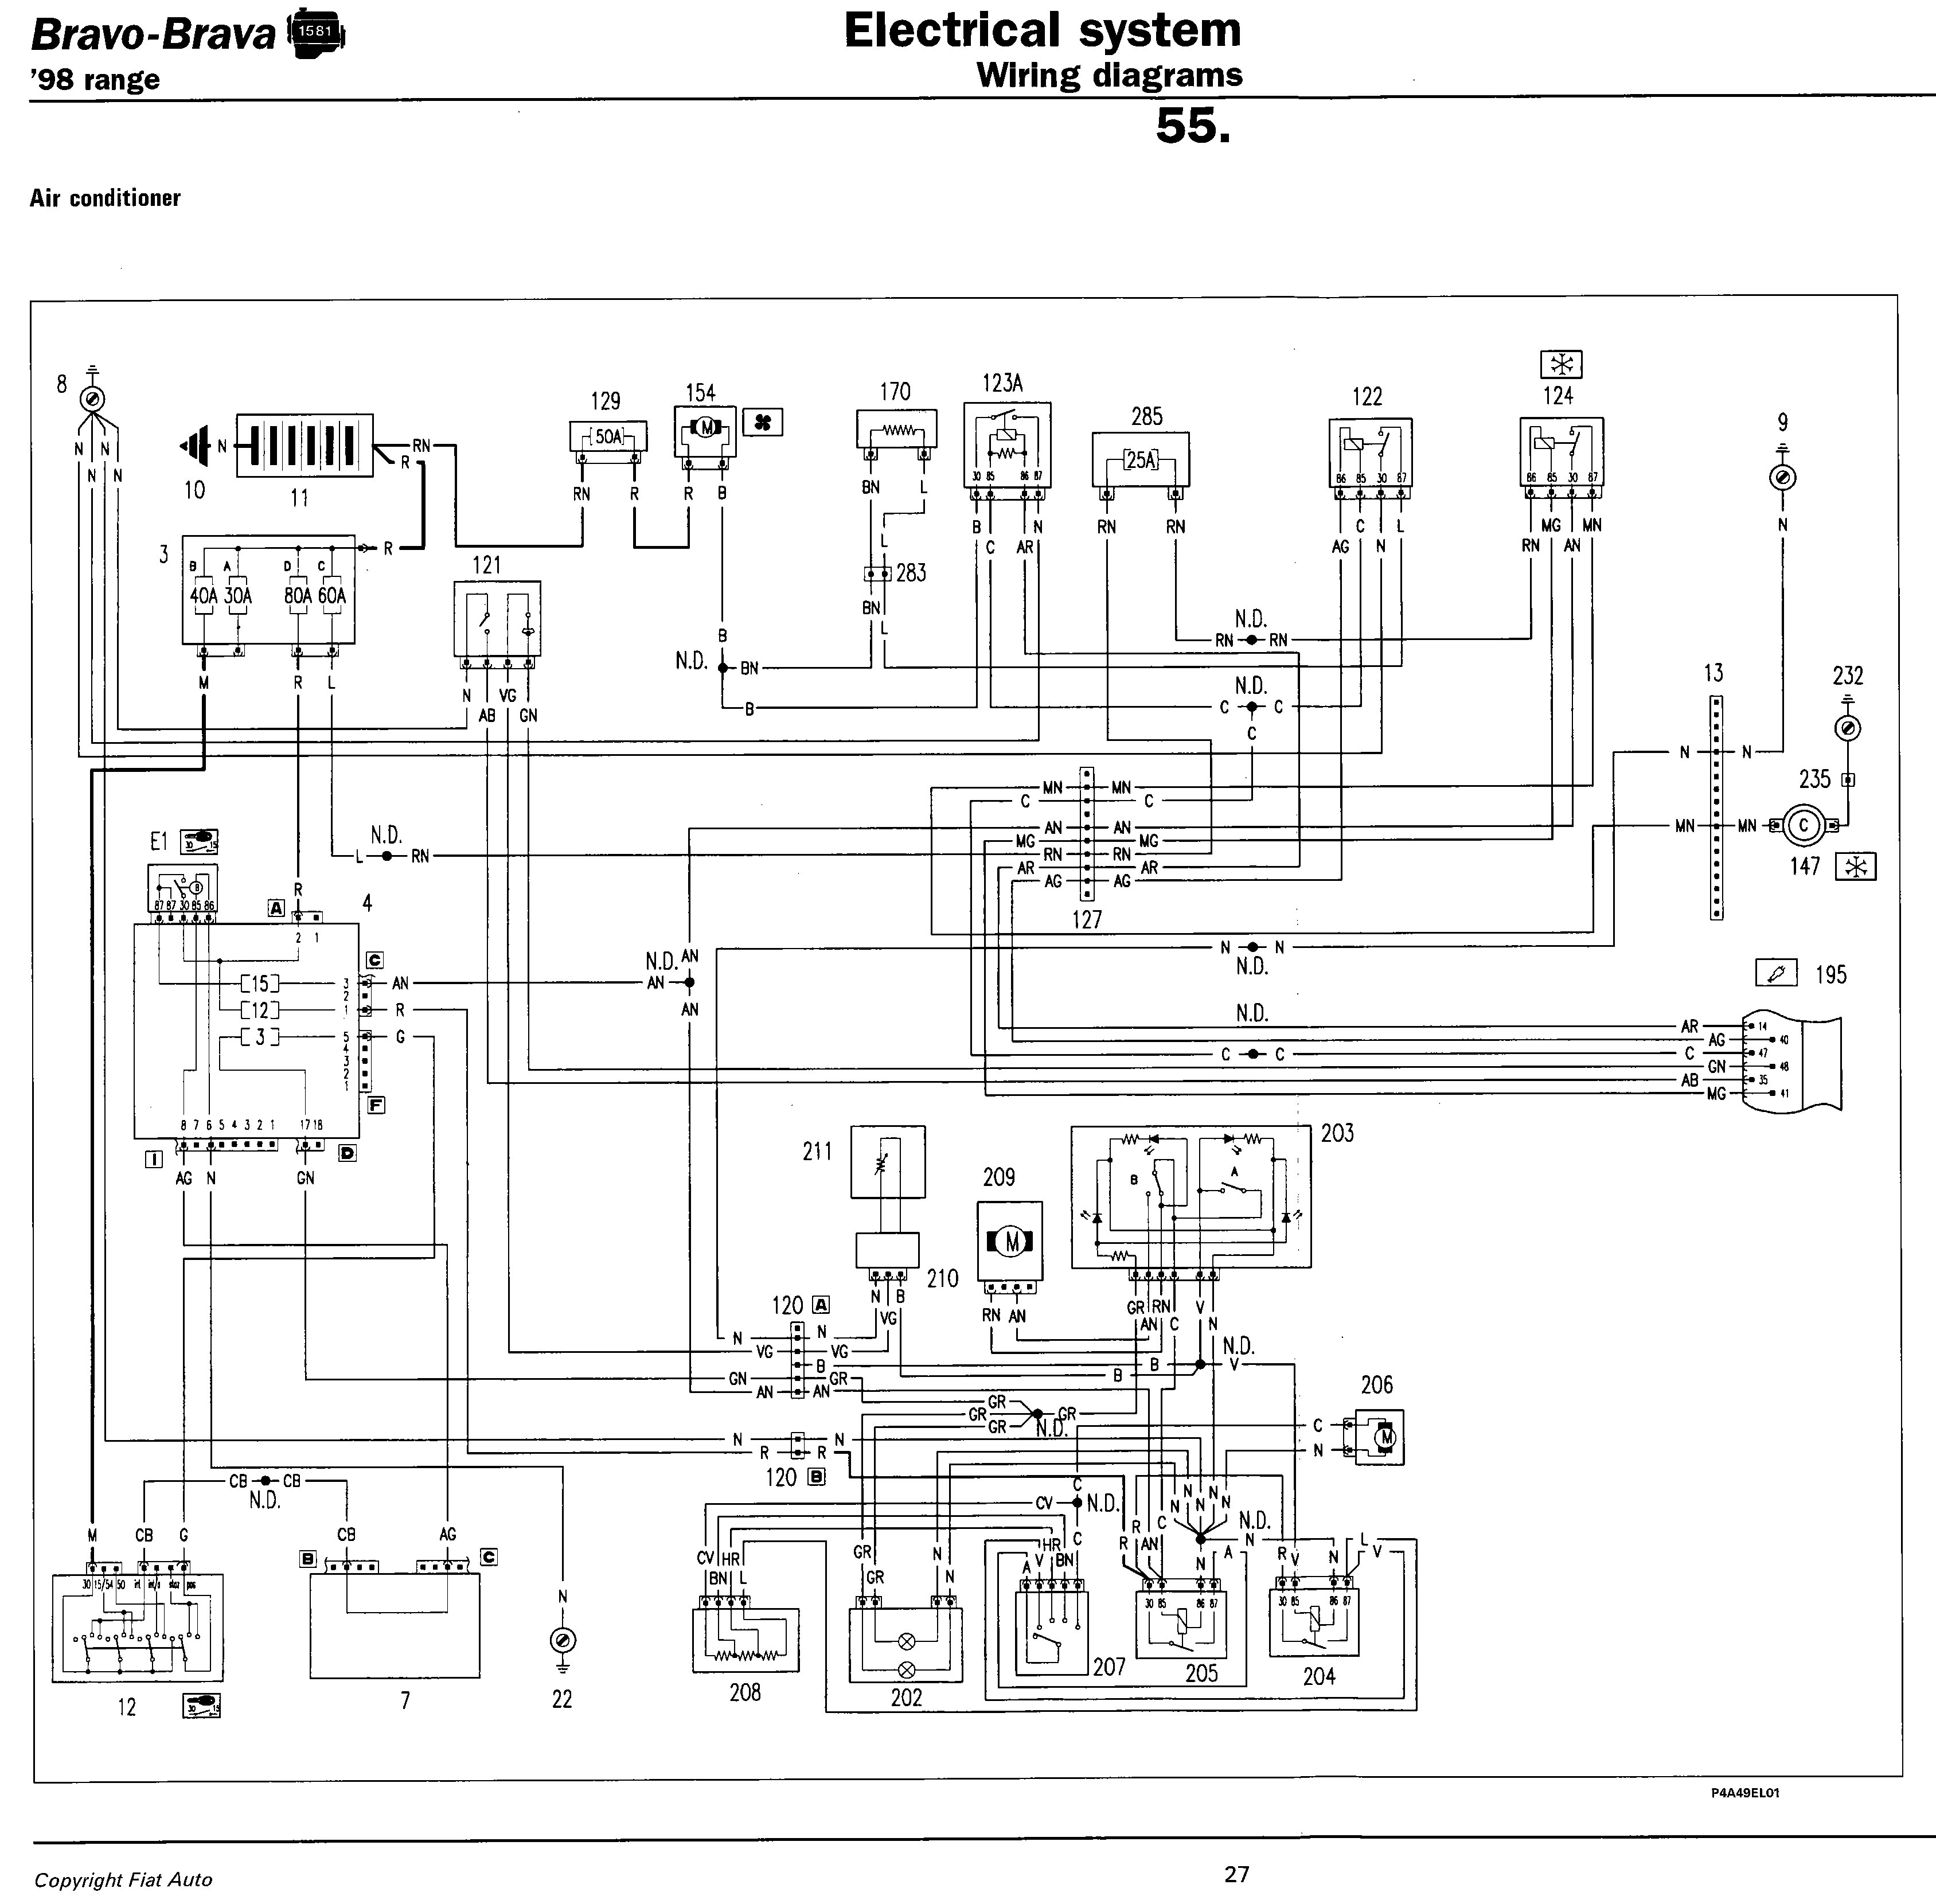 1975 Fiat Wiring Diagram Starter | automatic-strap Wiring Diagram union -  automatic-strap.buildingblocks2016.eubuildingblocks2016.eu